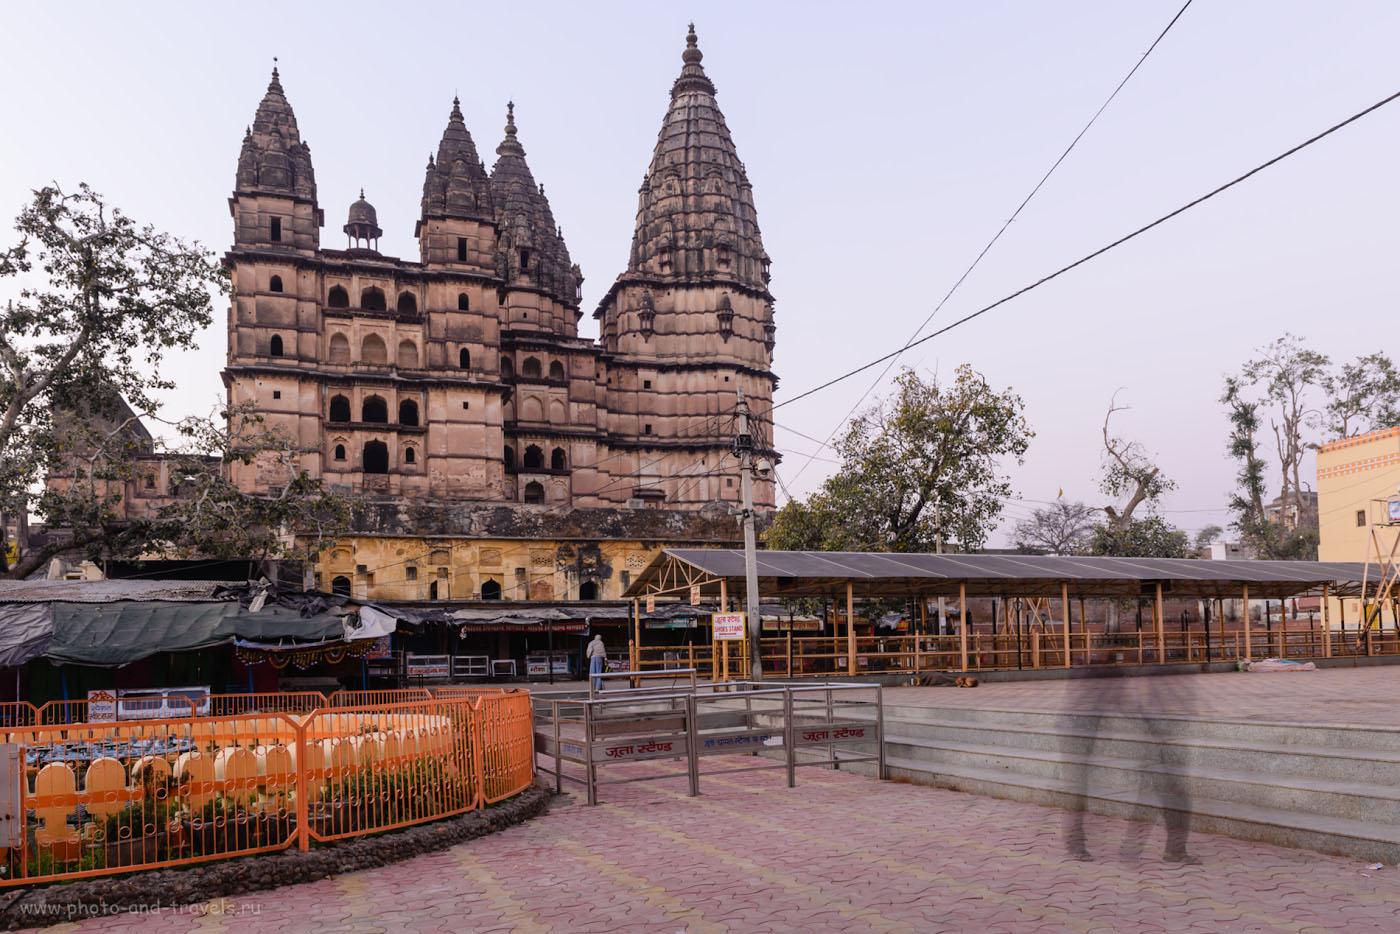 Фотография 9. На центральной площади Орчхи напротив храма Чатурбхудж Мандир. Утро в Индии. 1.6, -0.67, 9.0, 100, 24.